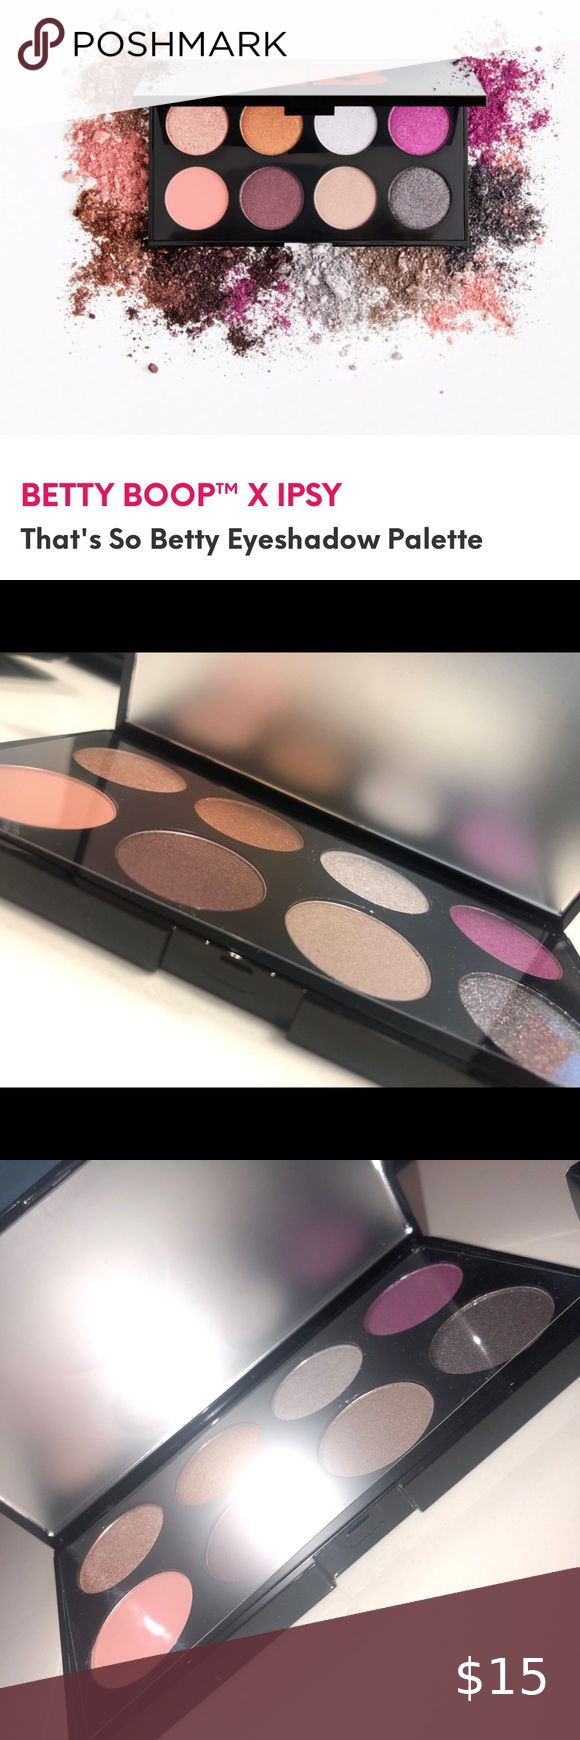 Betty Boop x Ipsy Eyeshadow palette brand new in 2020